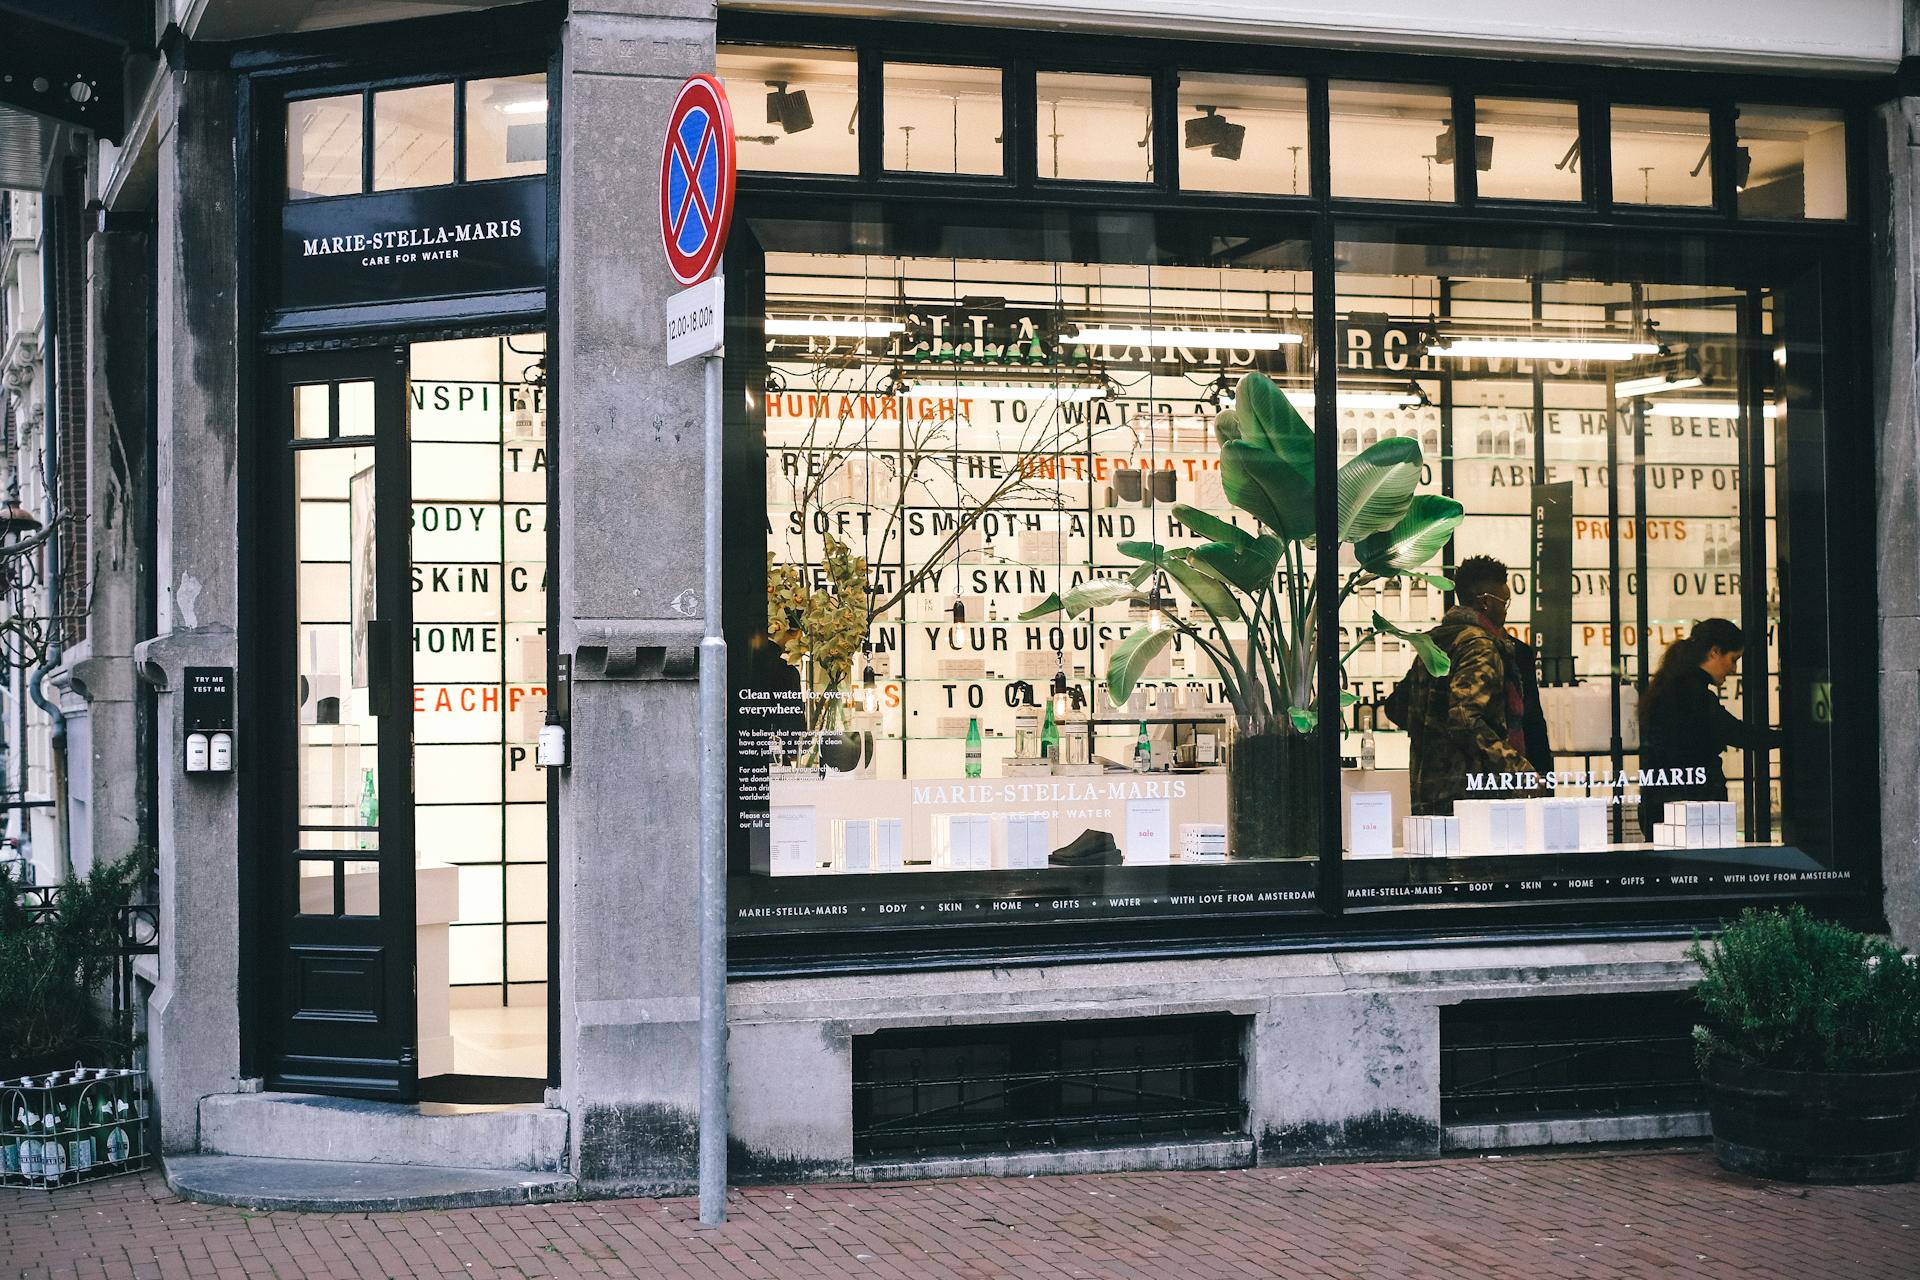 Amsterdam, Marie-Stella-Maris